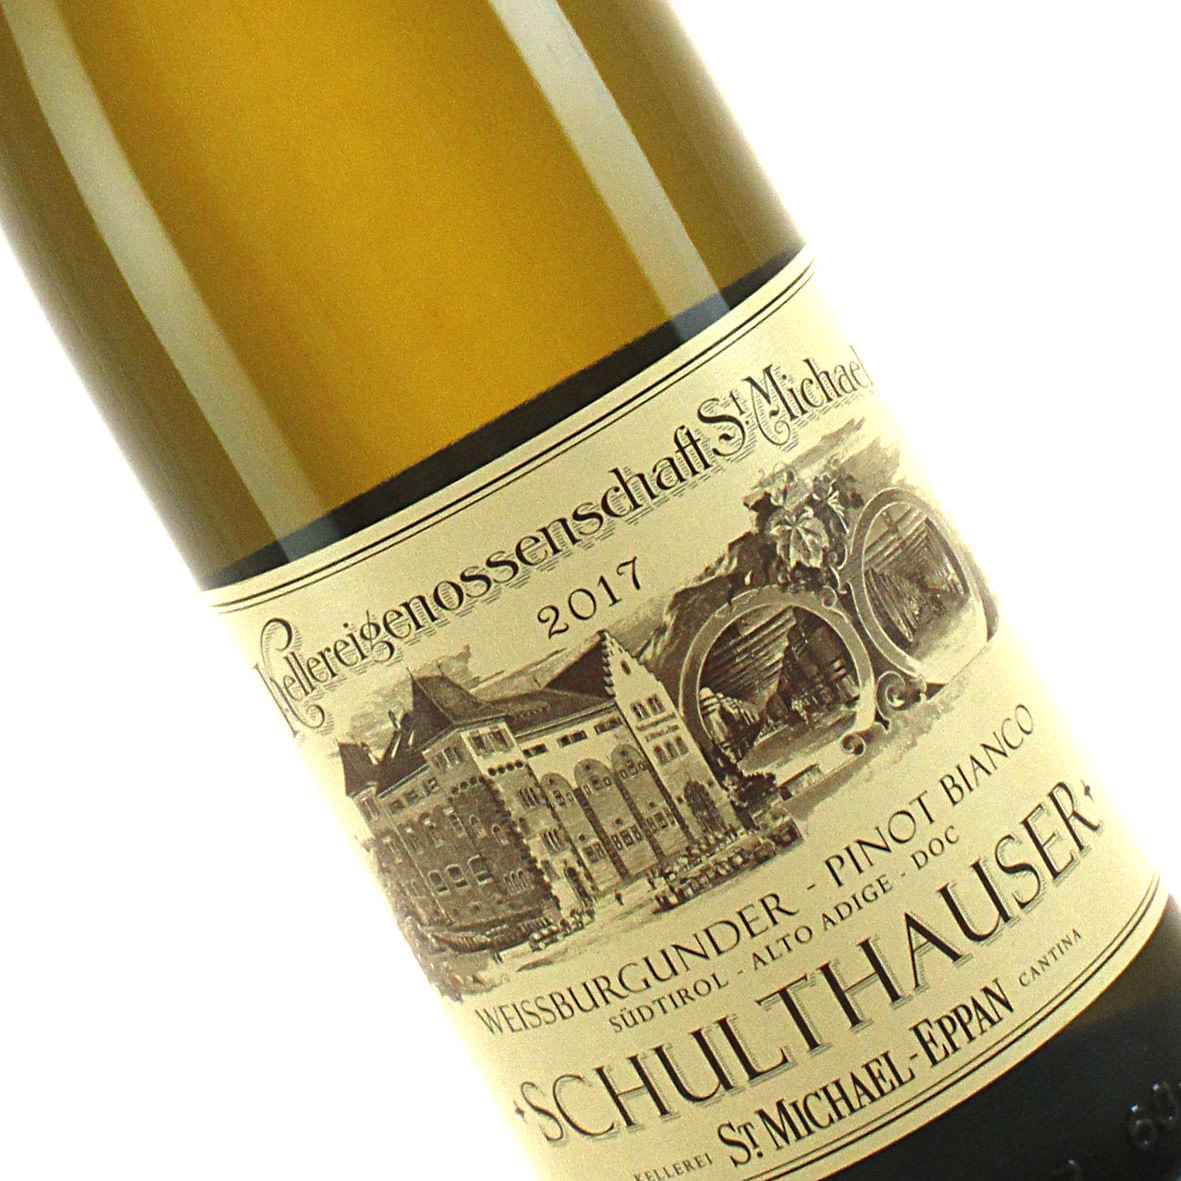 "St. Michael-Eppan 2017 Pinot Bianco ""Schulthauser"", Sudtirol-Alto Adige Italy"